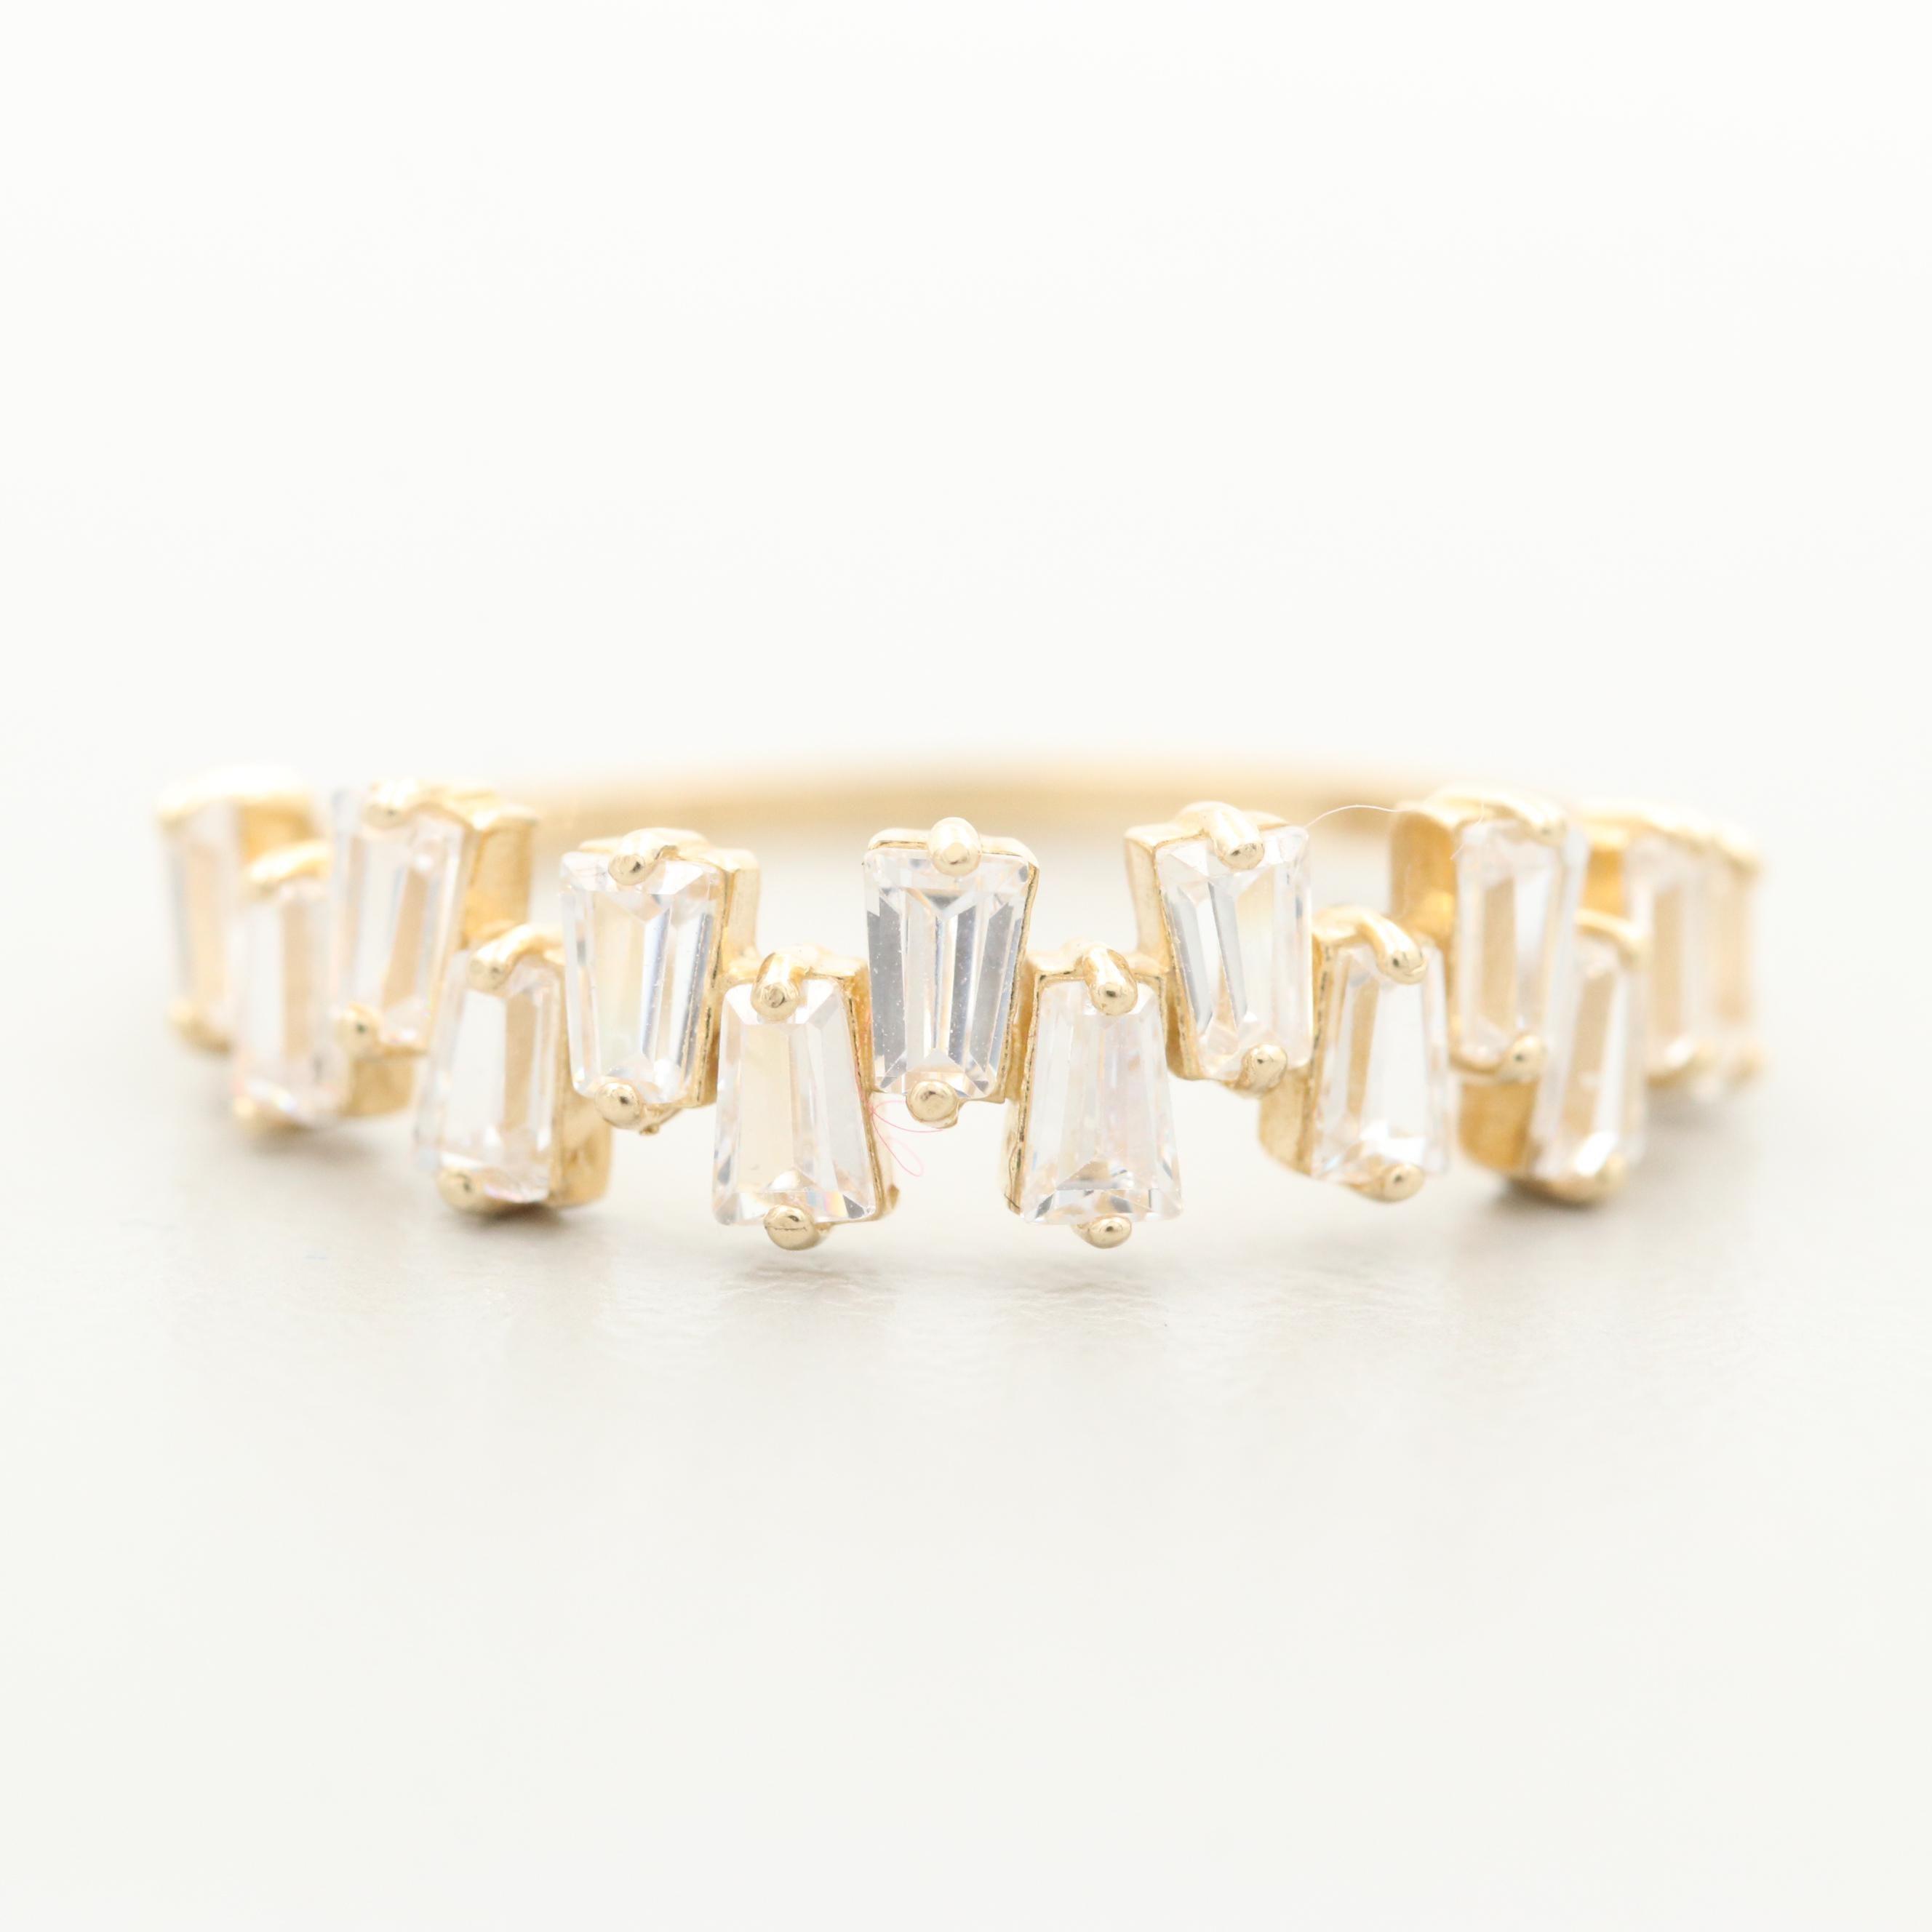 10K Yellow Gold Cubic Zirconia Ring